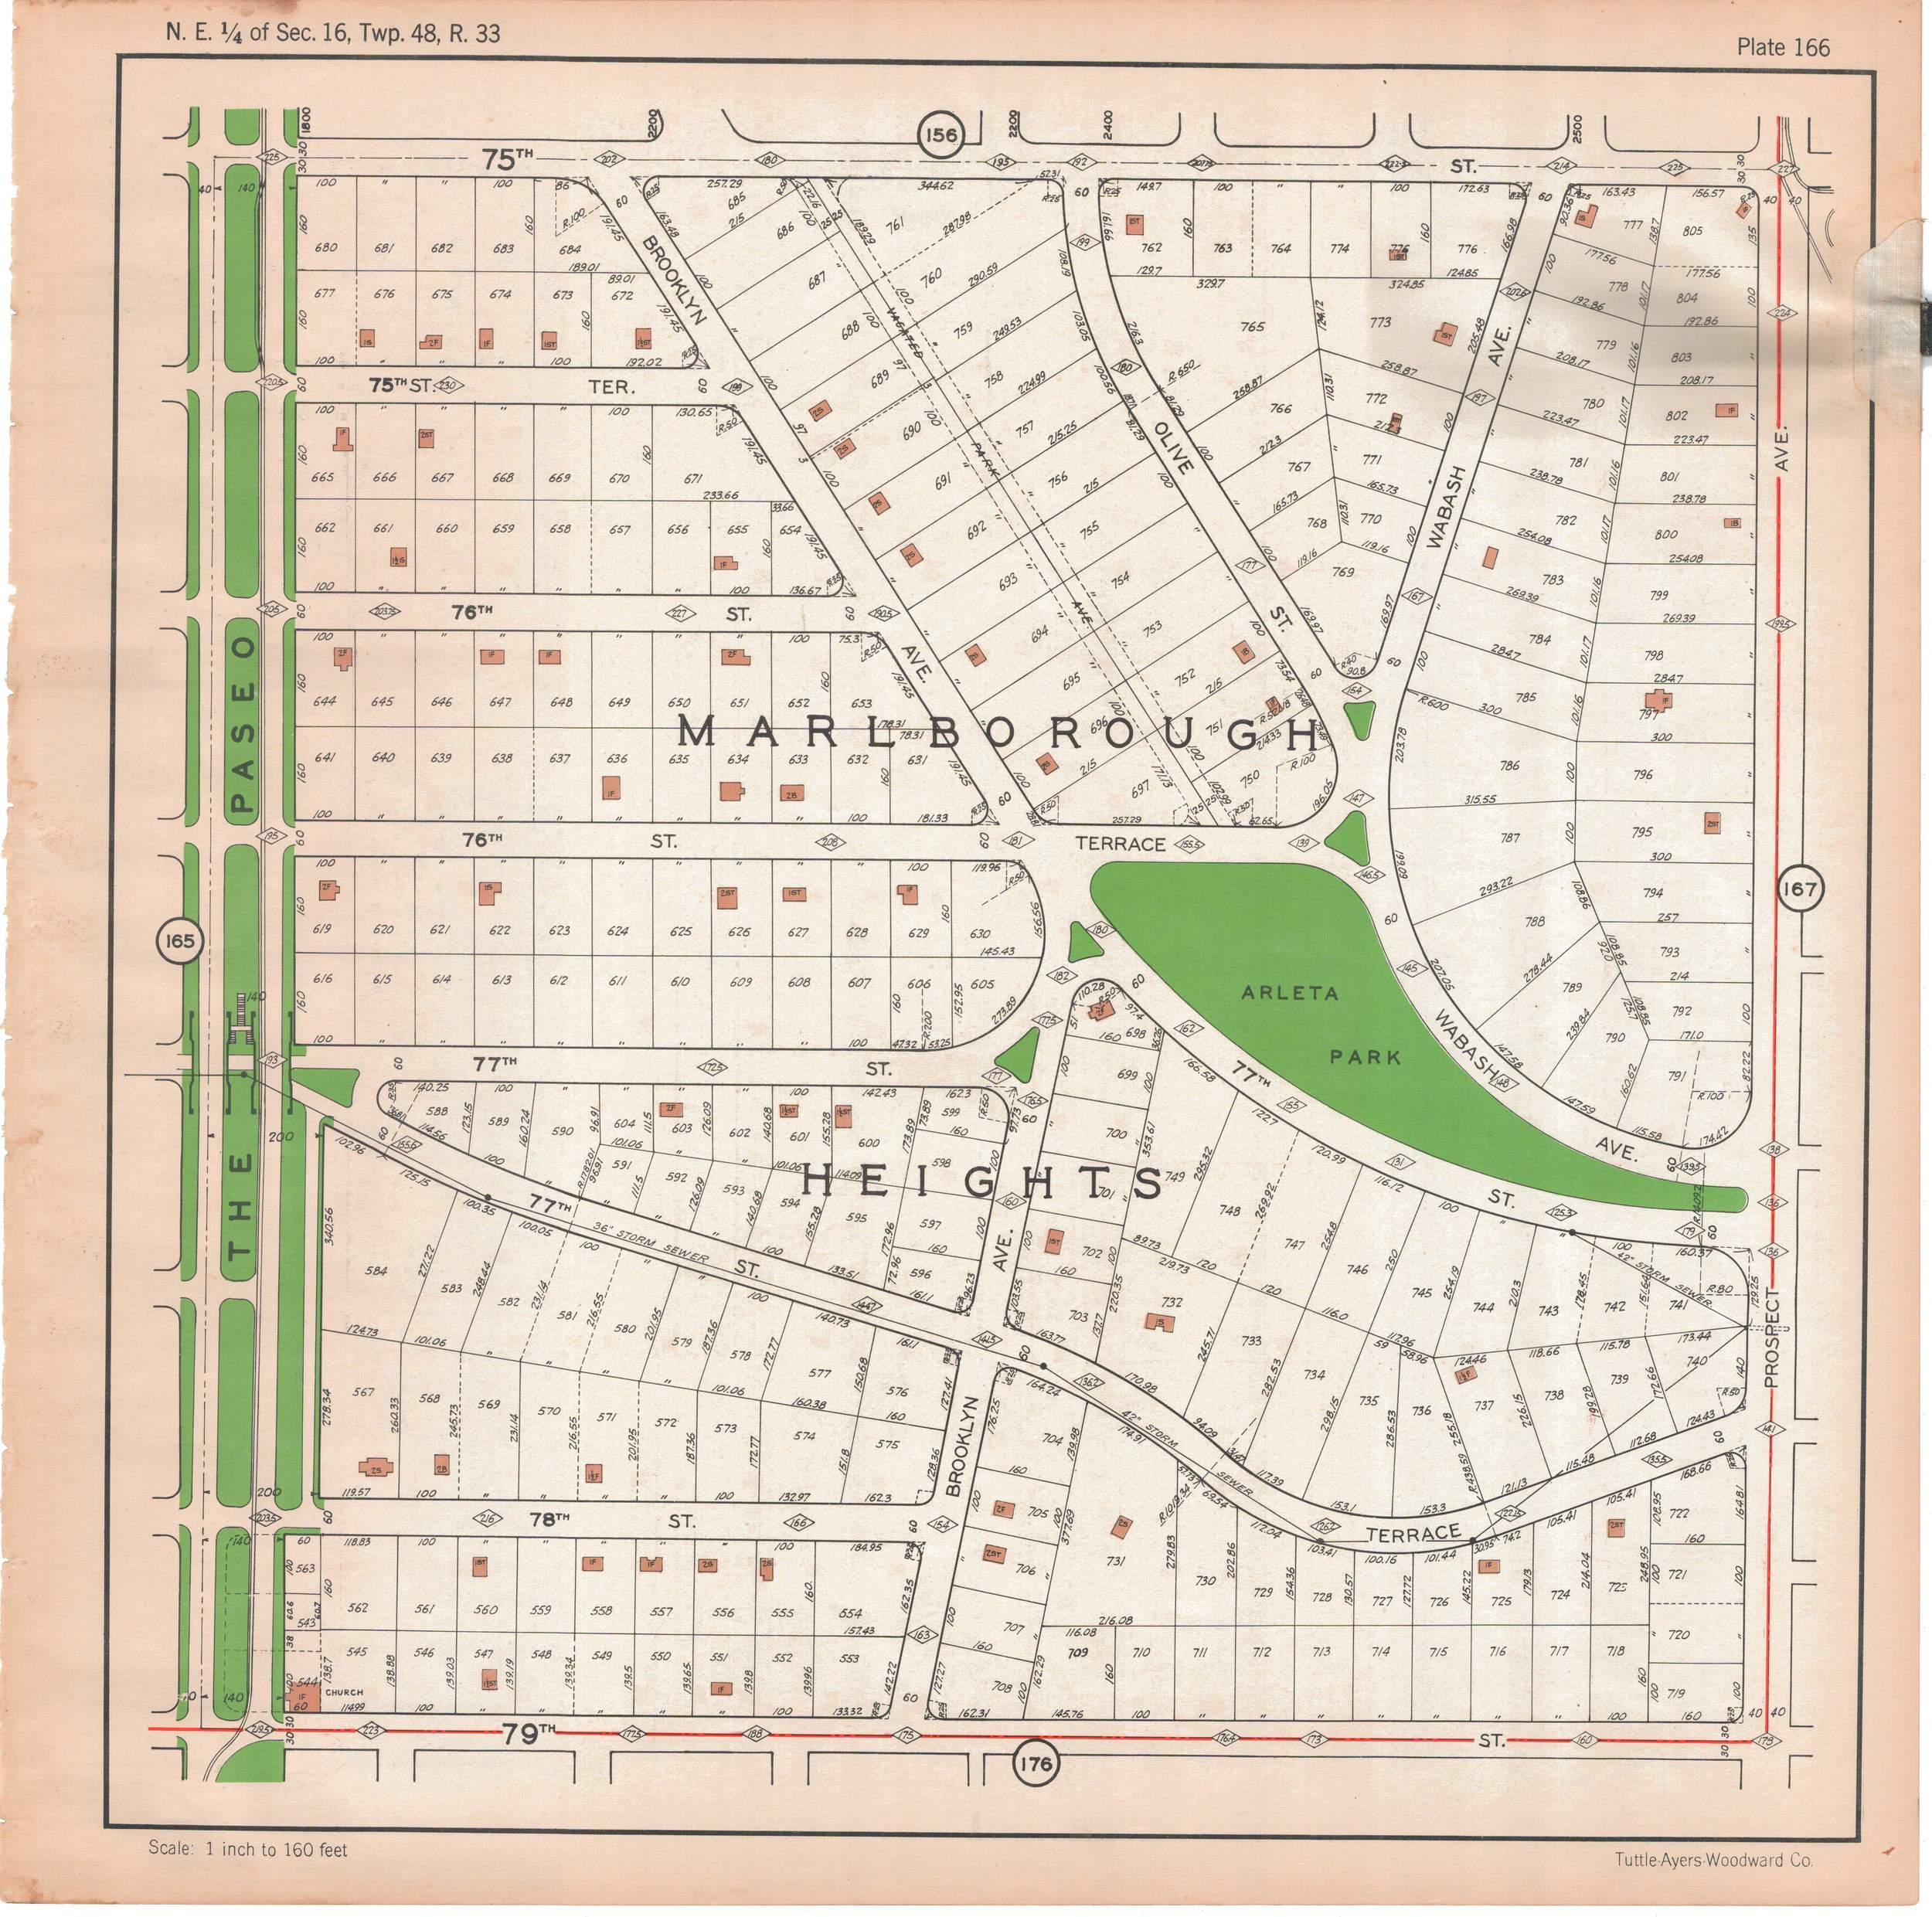 1925 TUTTLE_AYERS_Plate_166.JPG